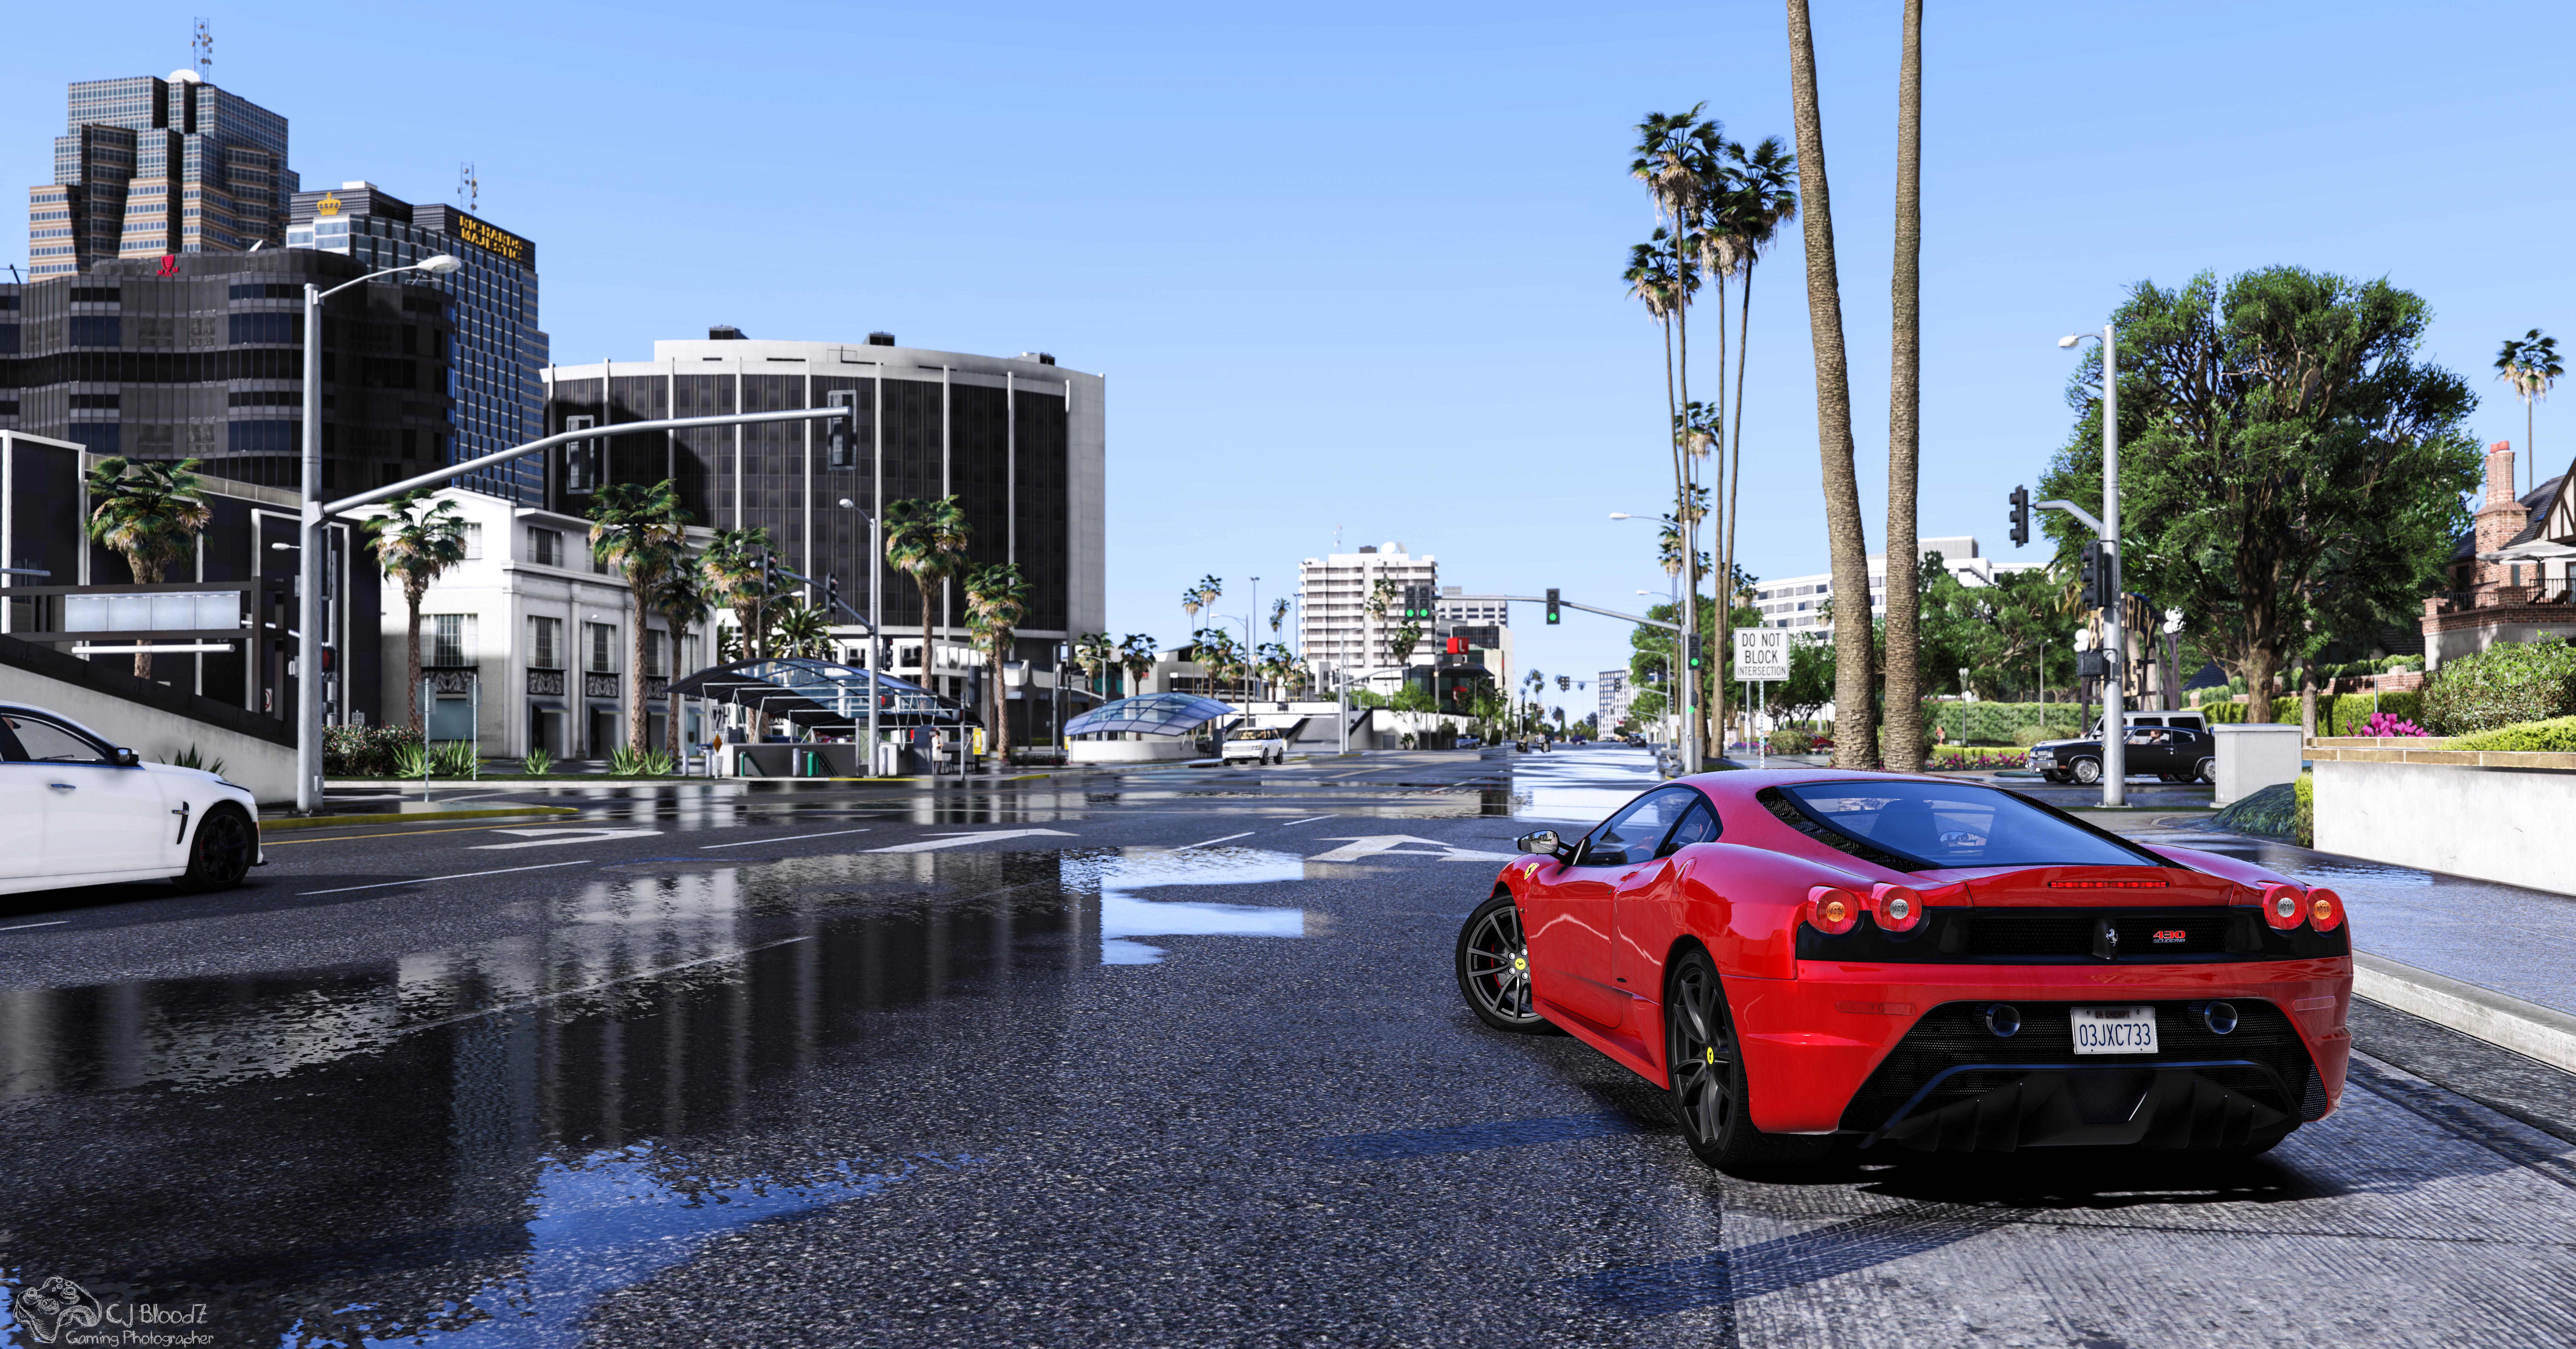 Gta V Ferrari 8k, HD Cars, 4k Wallpapers, Images ...